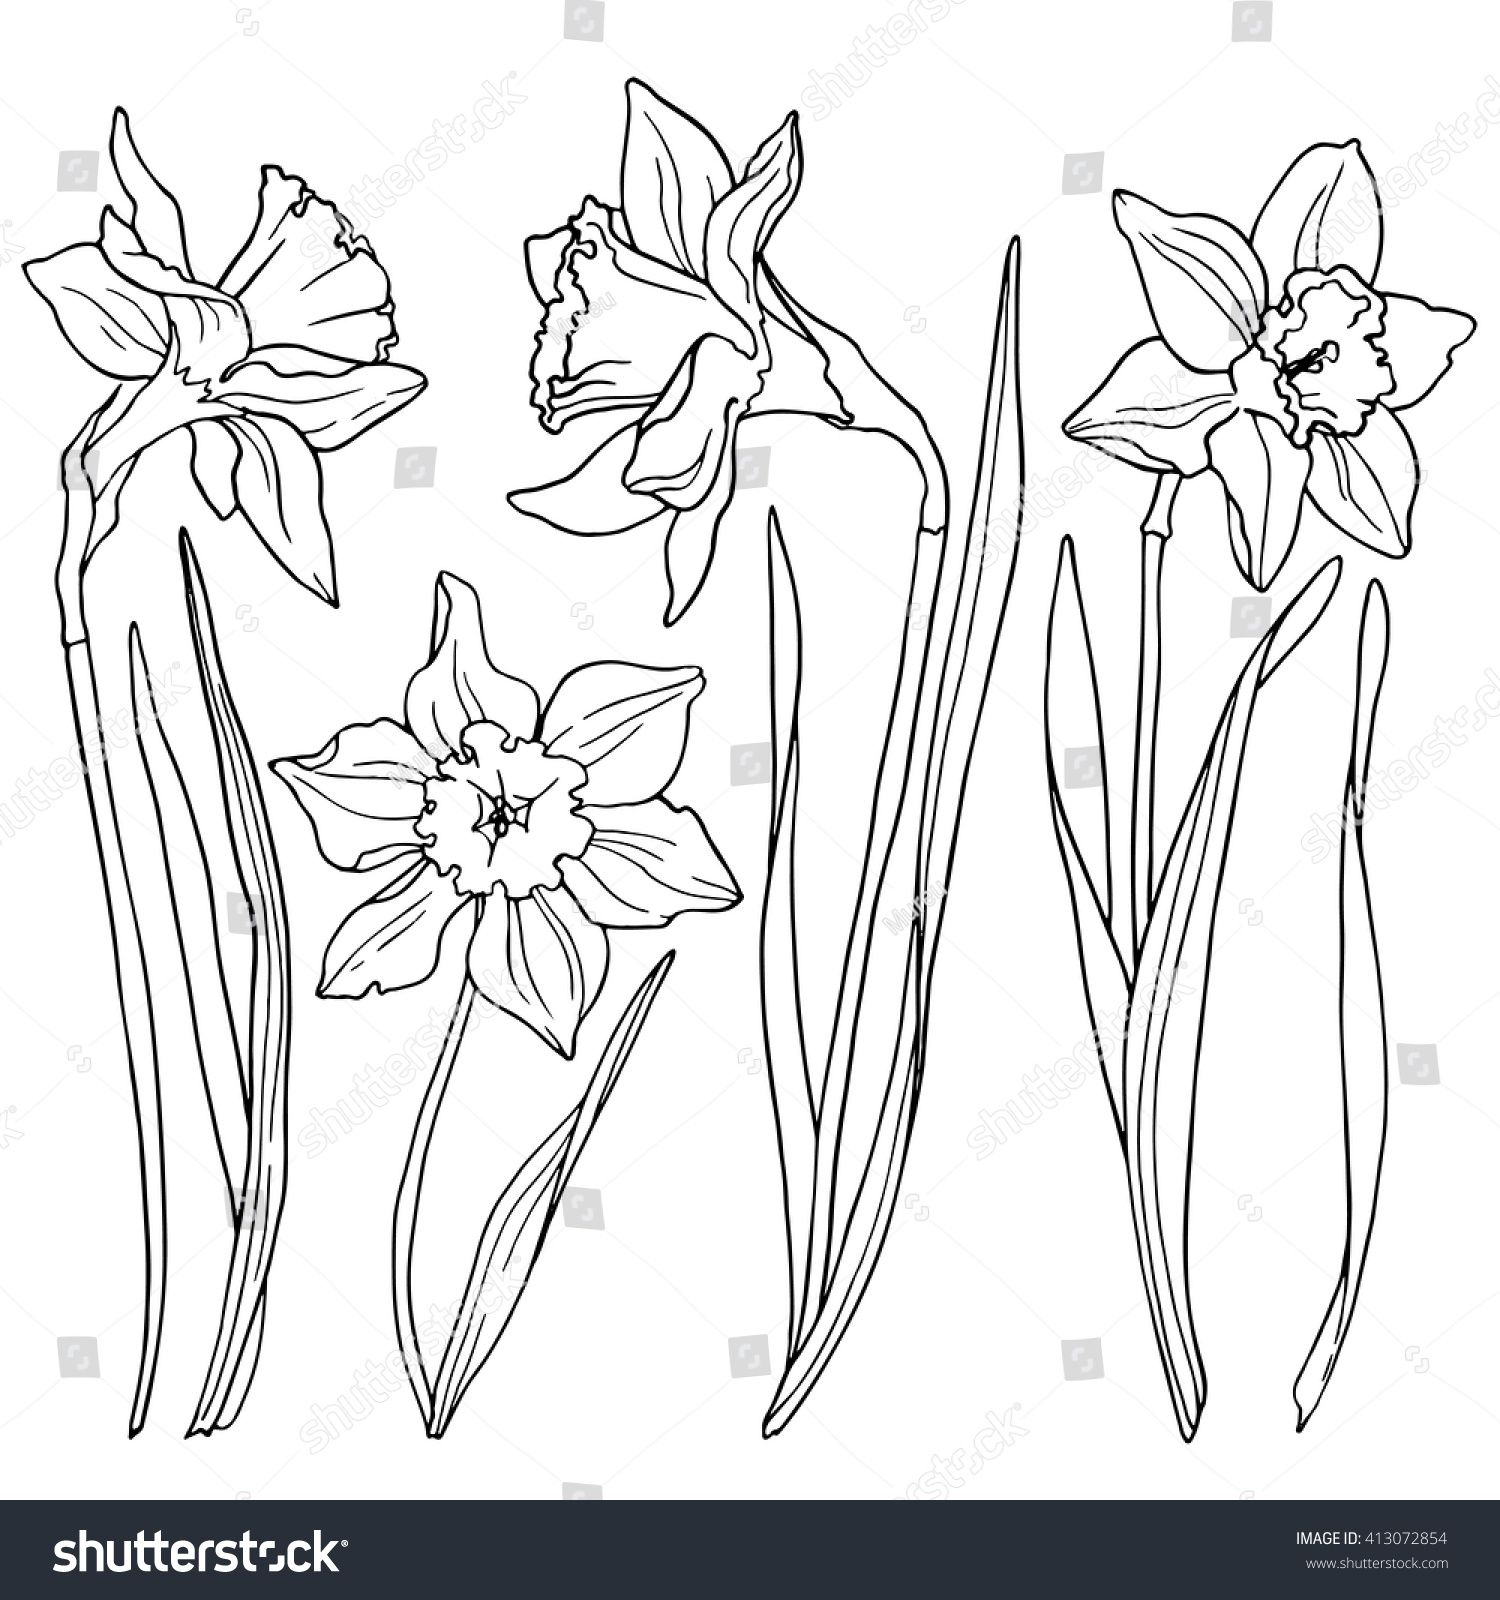 Daffodils Line Drawings Of Flowers Flower Drawing Flower Line Drawings Flower Sketches